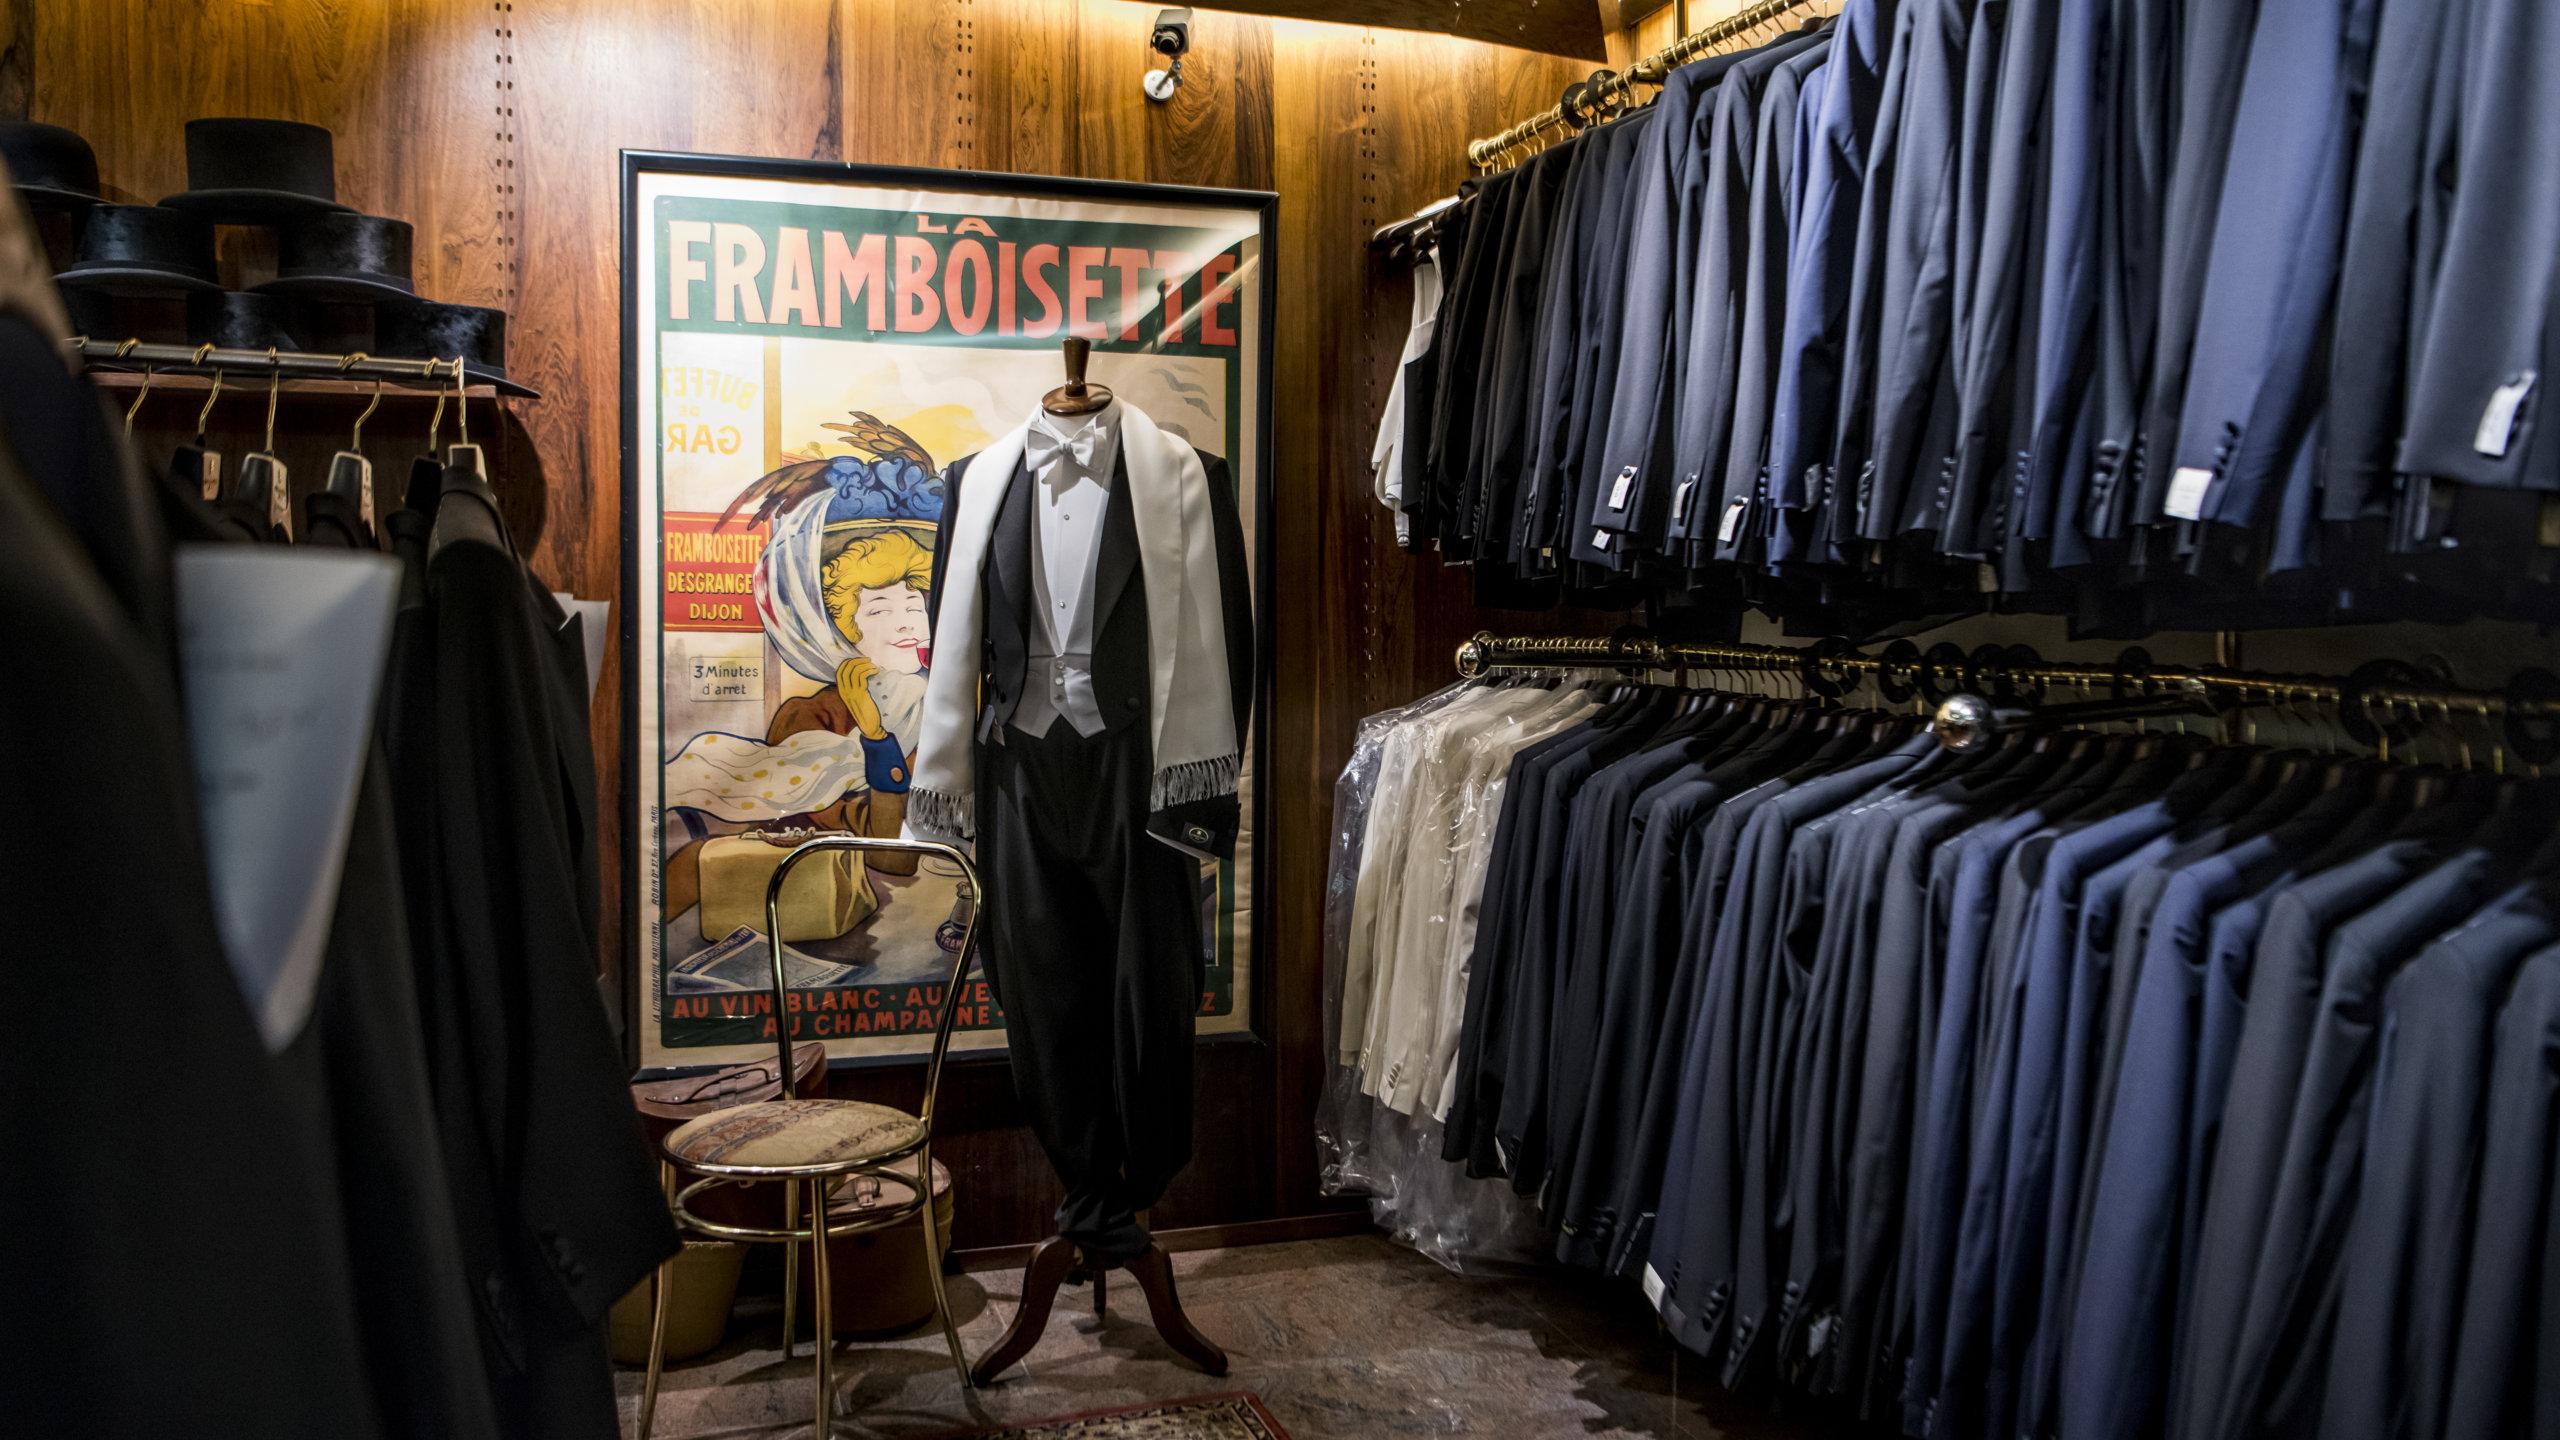 The Dress Code Nobelprizeorg